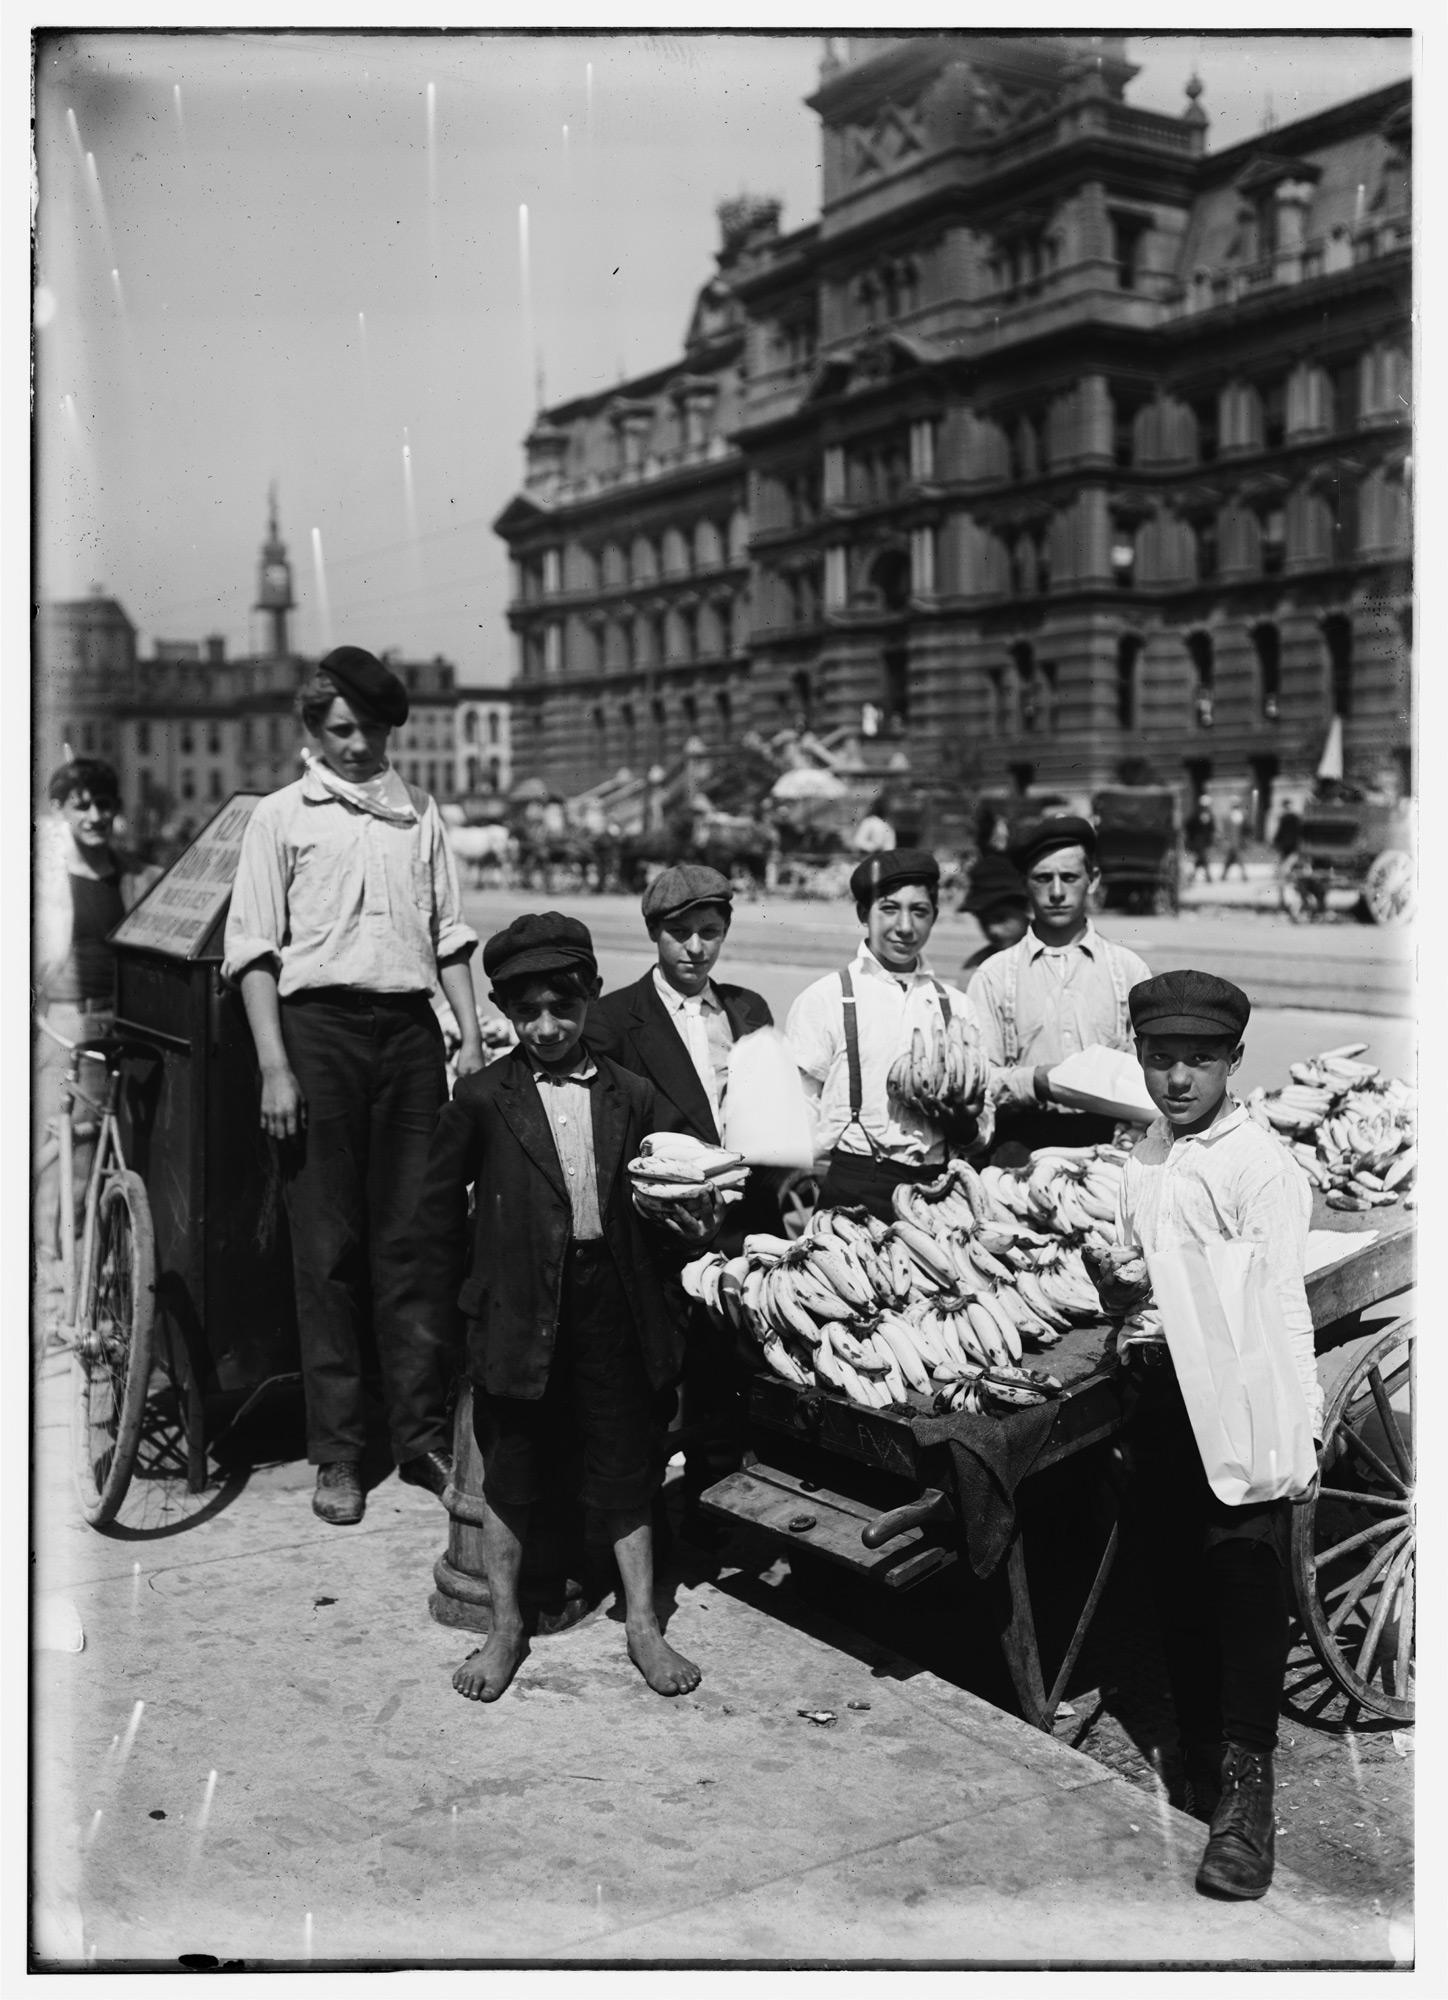 Lewis Wickes Hine /Indianapolis fruit venders, Italian boys, Indiana, August /(1908)